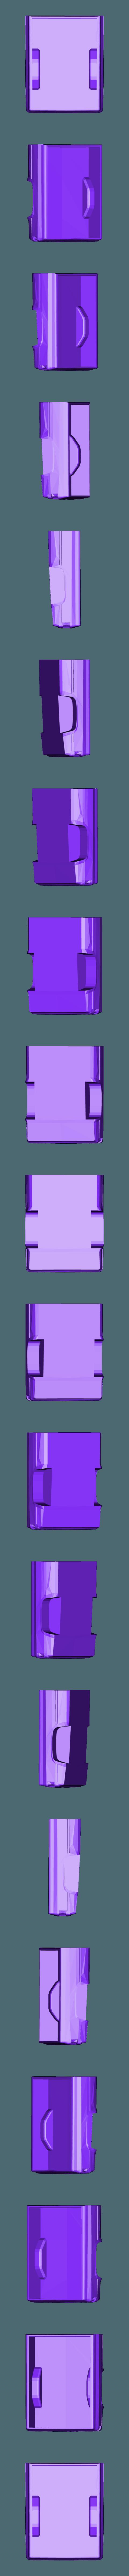 platon.stl Download STL file gmc sierra truck • Template to 3D print, 3Diego